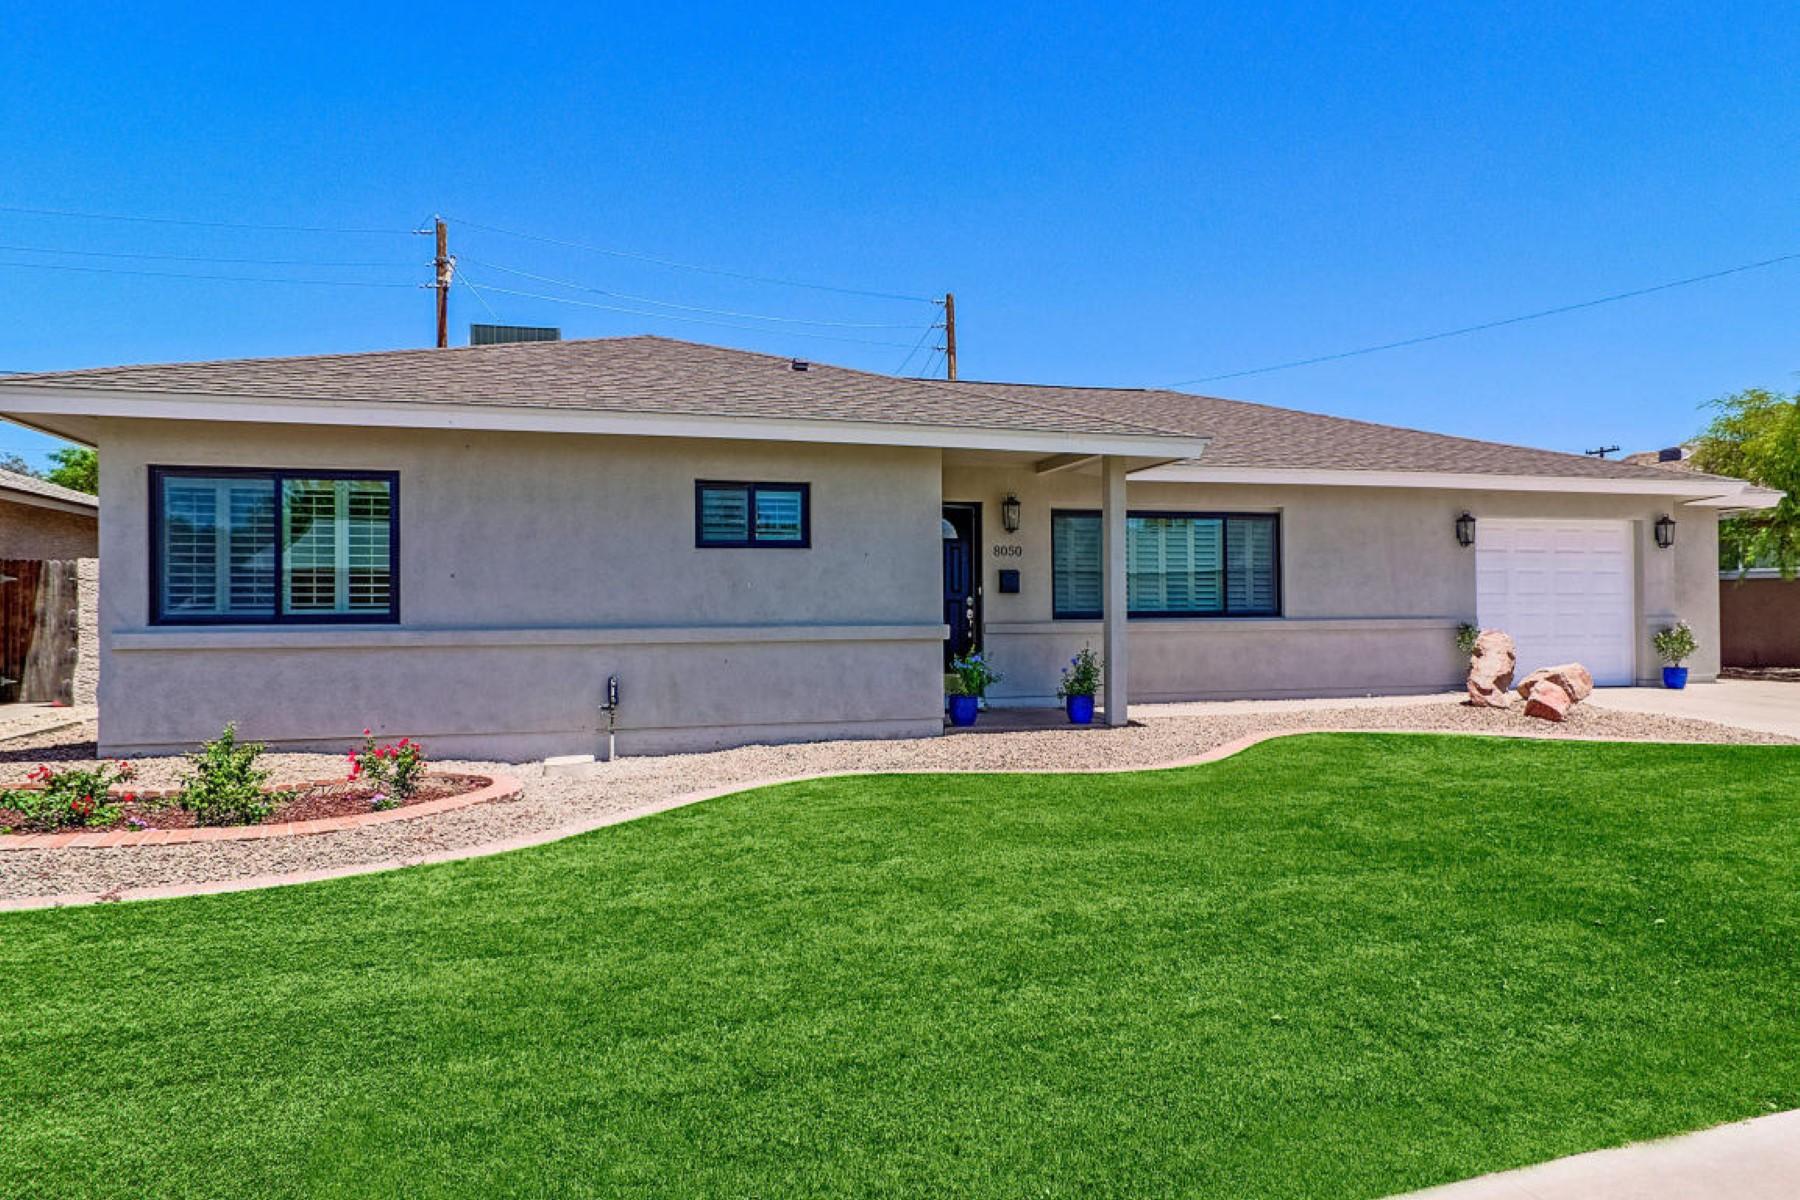 独户住宅 为 销售 在 Amazing South Scottsdale Remodel 8050 E Windsor Ave 斯科茨代尔, 亚利桑那州, 85257 美国